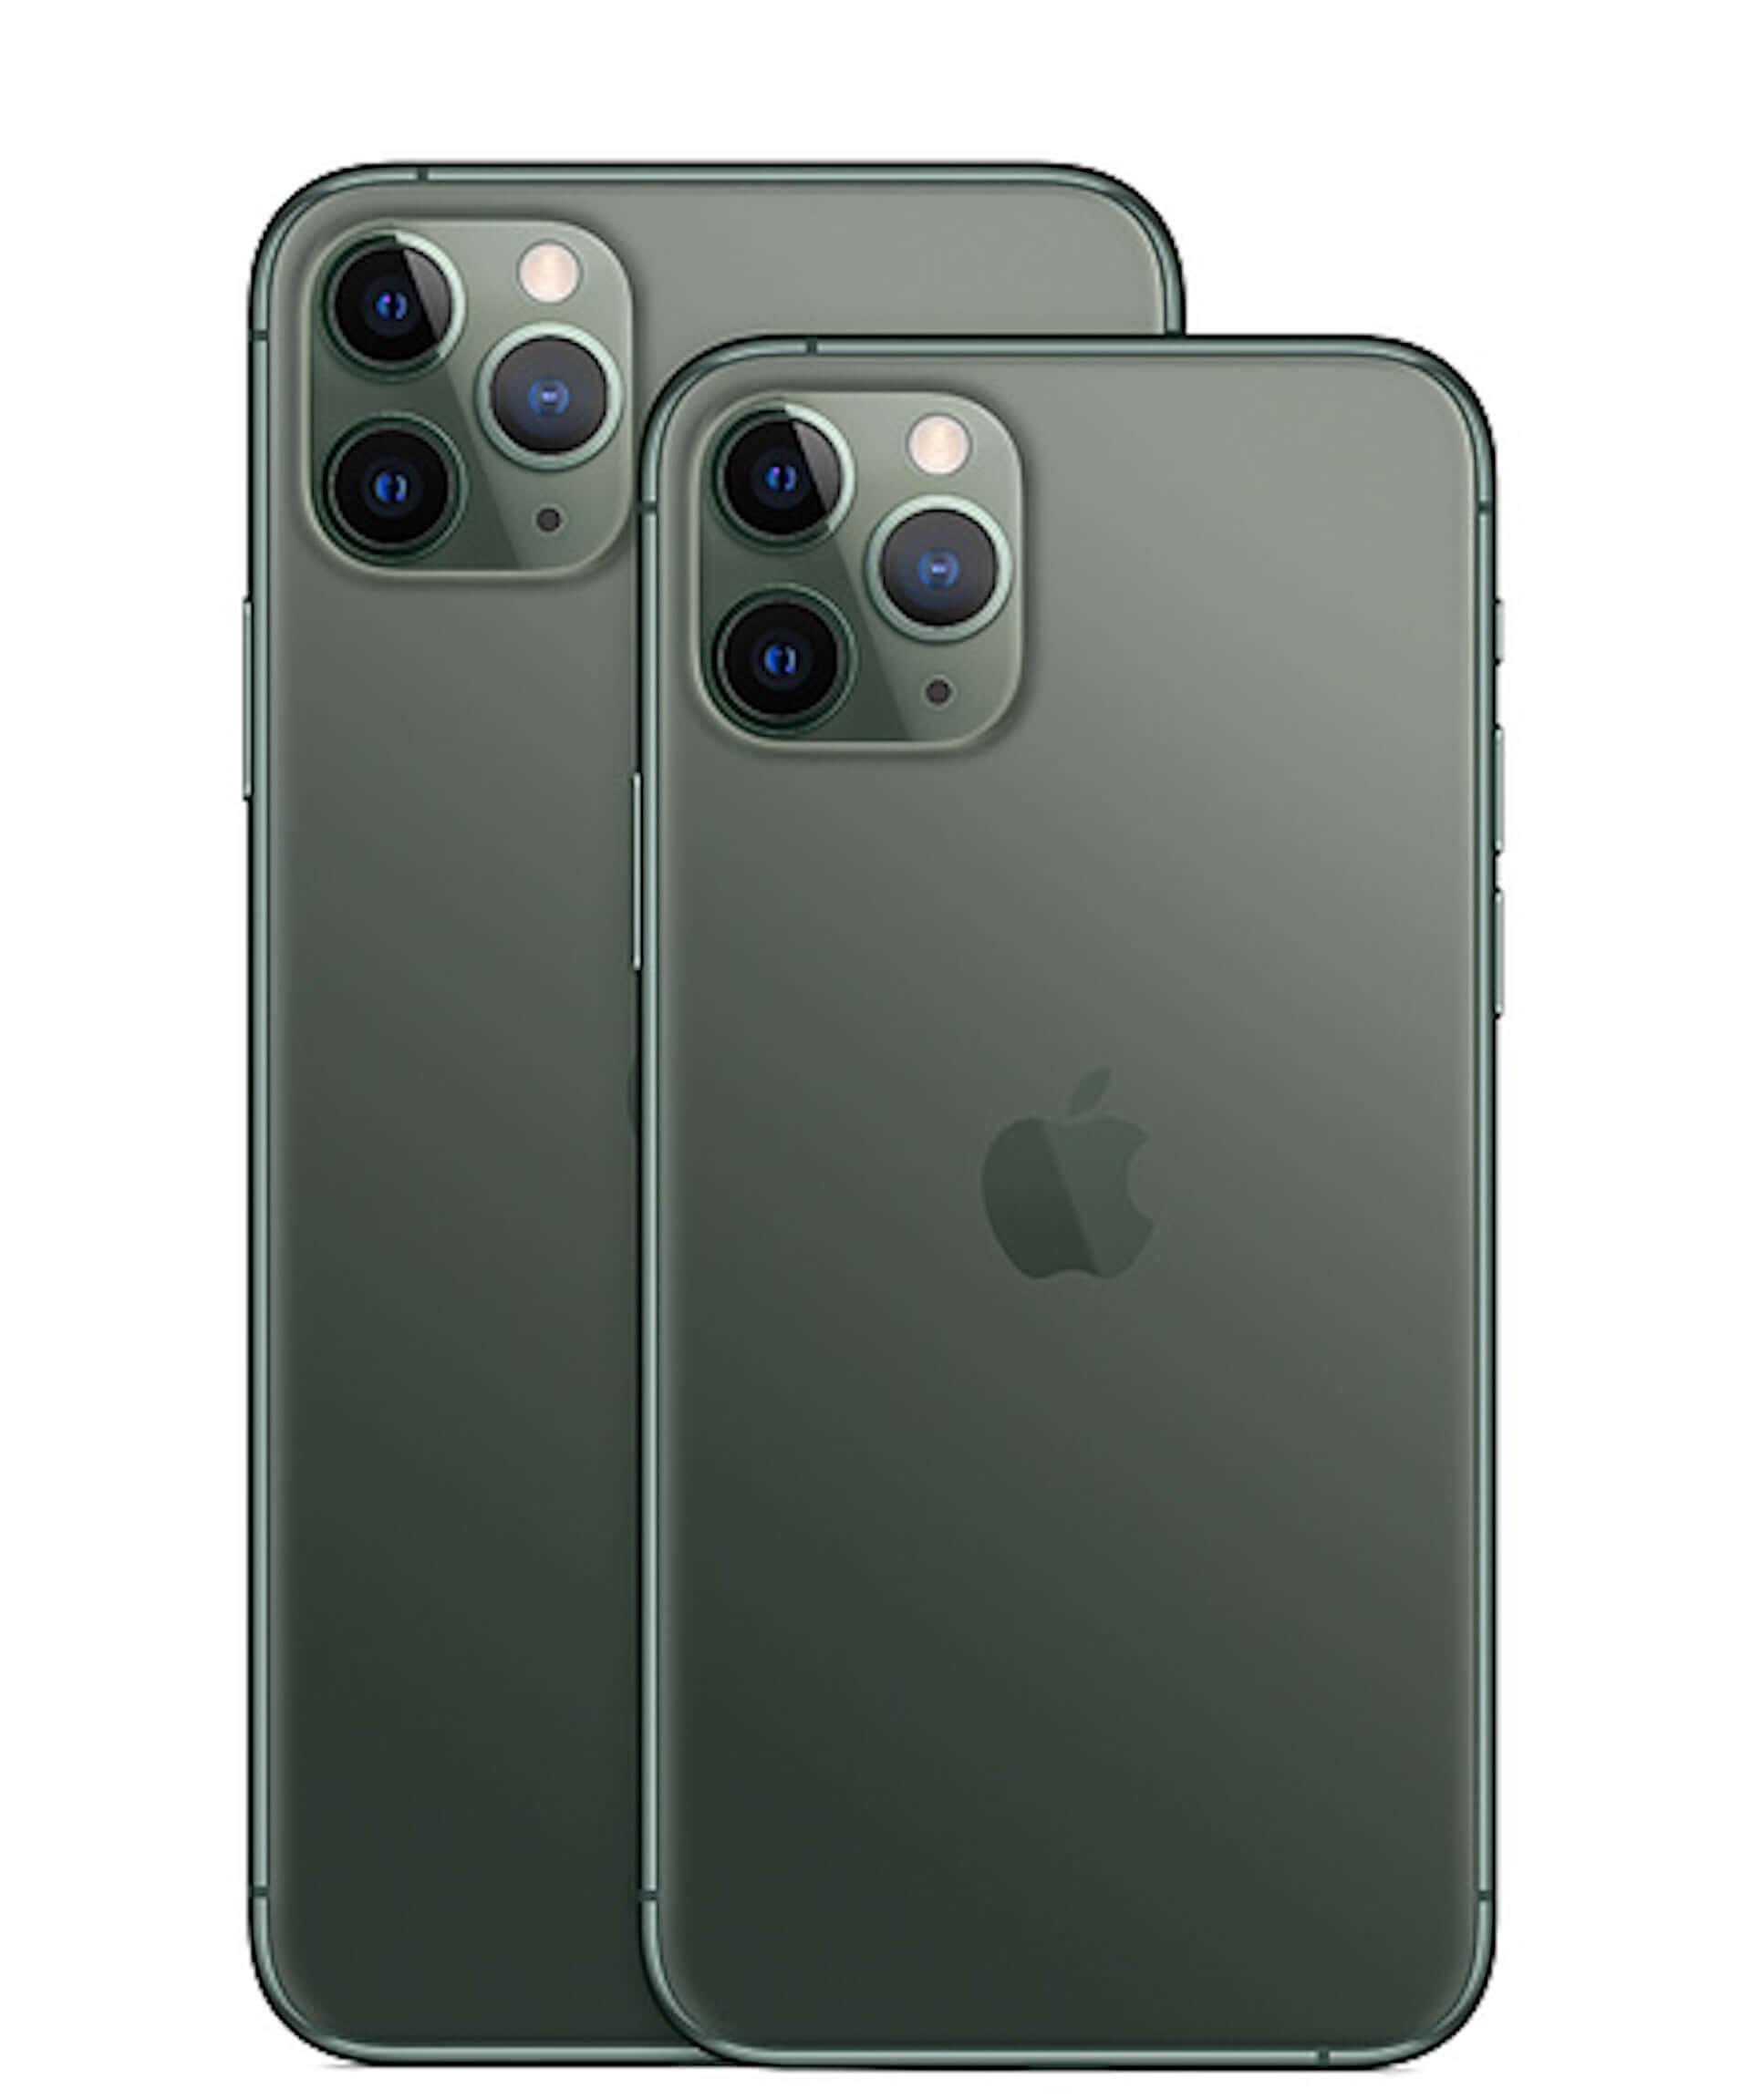 Apple、「iPhone 11 Pro」「iPhone 11 Pro Max」を発表!カメラ3つのトリプルカメラ搭載 tech190911_apple_iphone11_main-1920x2303